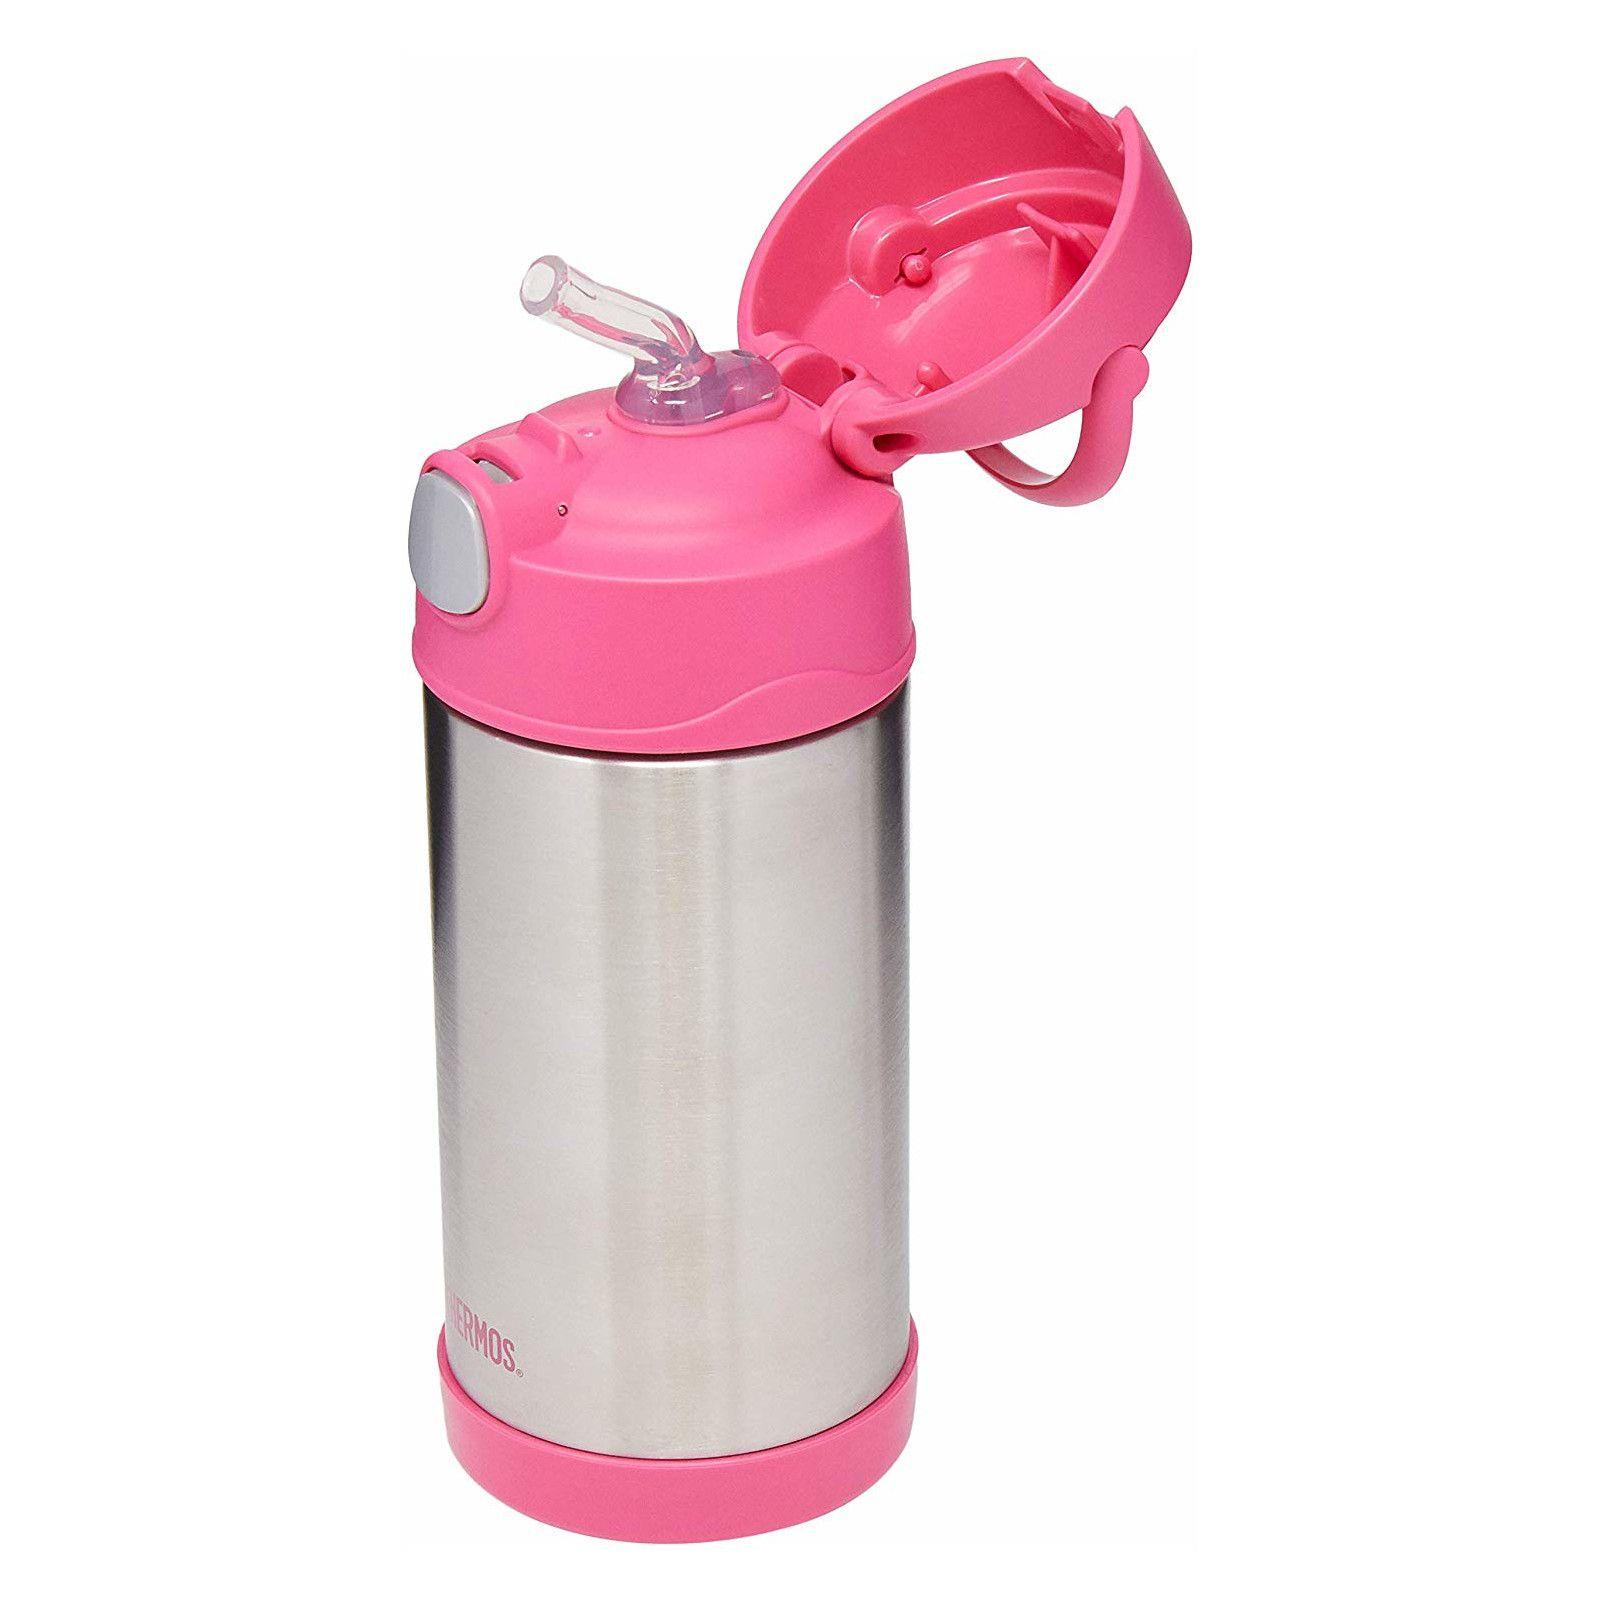 Garrafinha Térmica Funtainer 355 ml Rosa e Inox Thermos